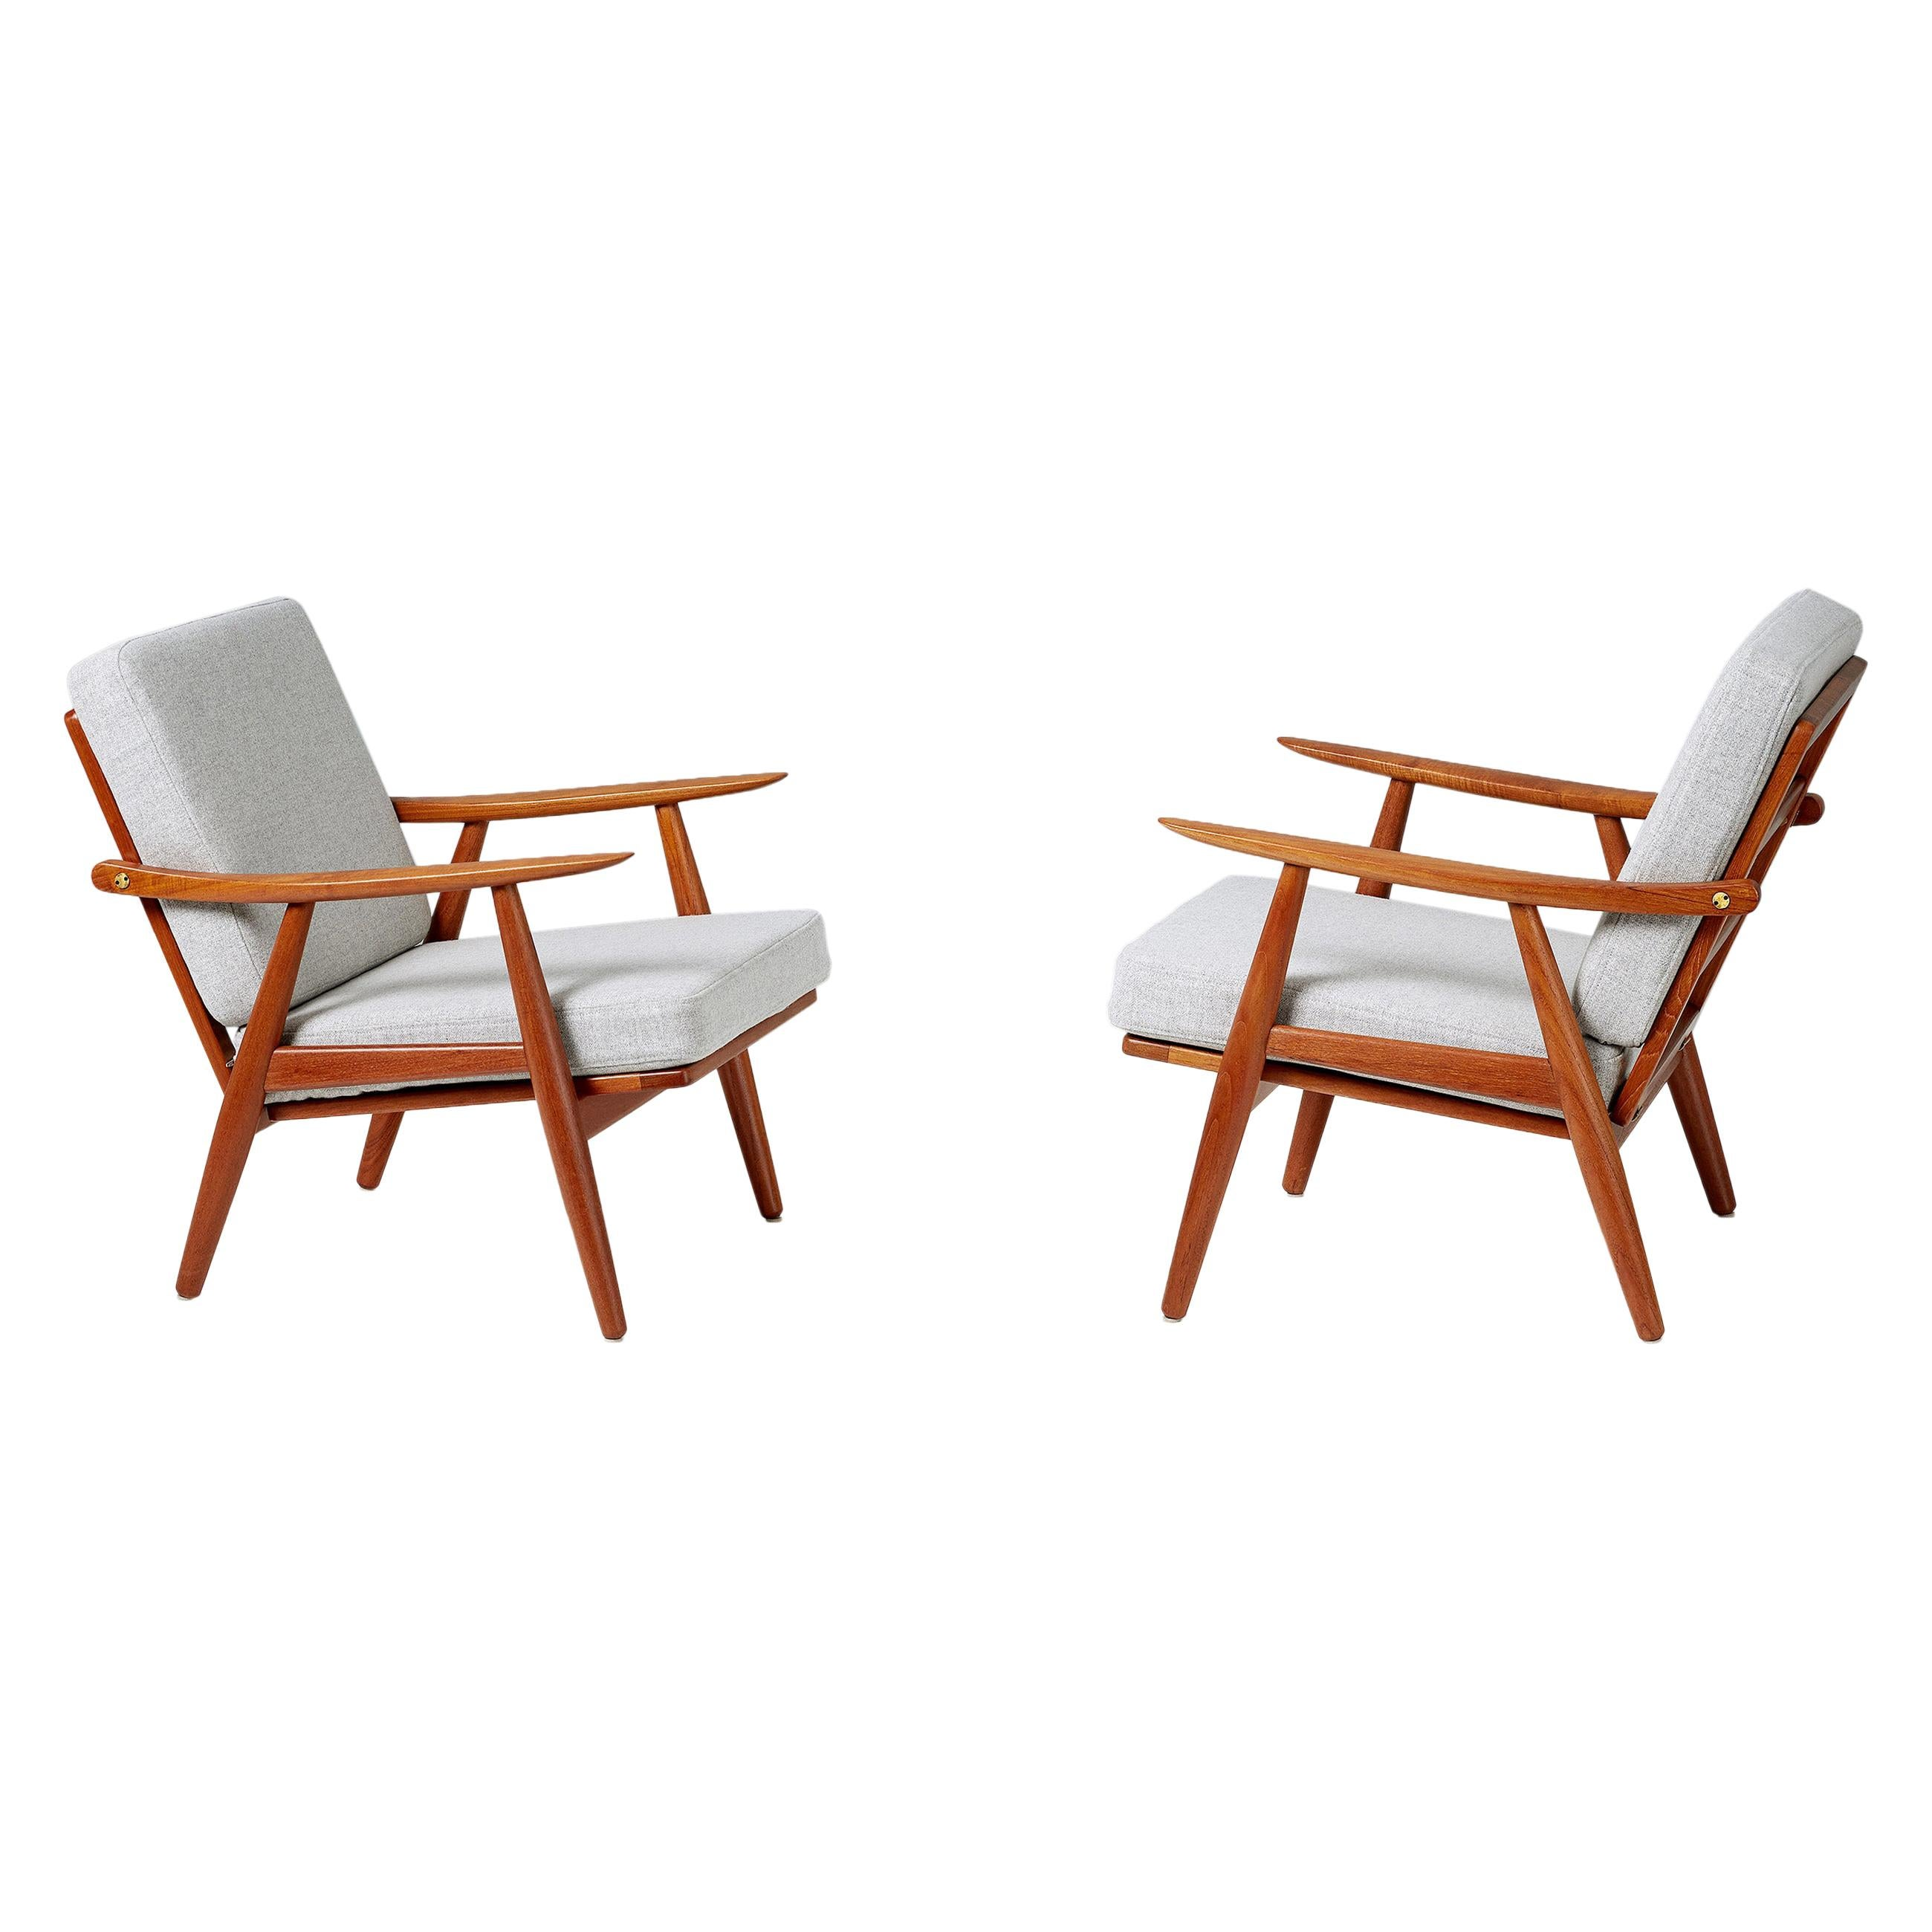 Hans Wegner GE-270 Pair of Lounge Chairs, 1956